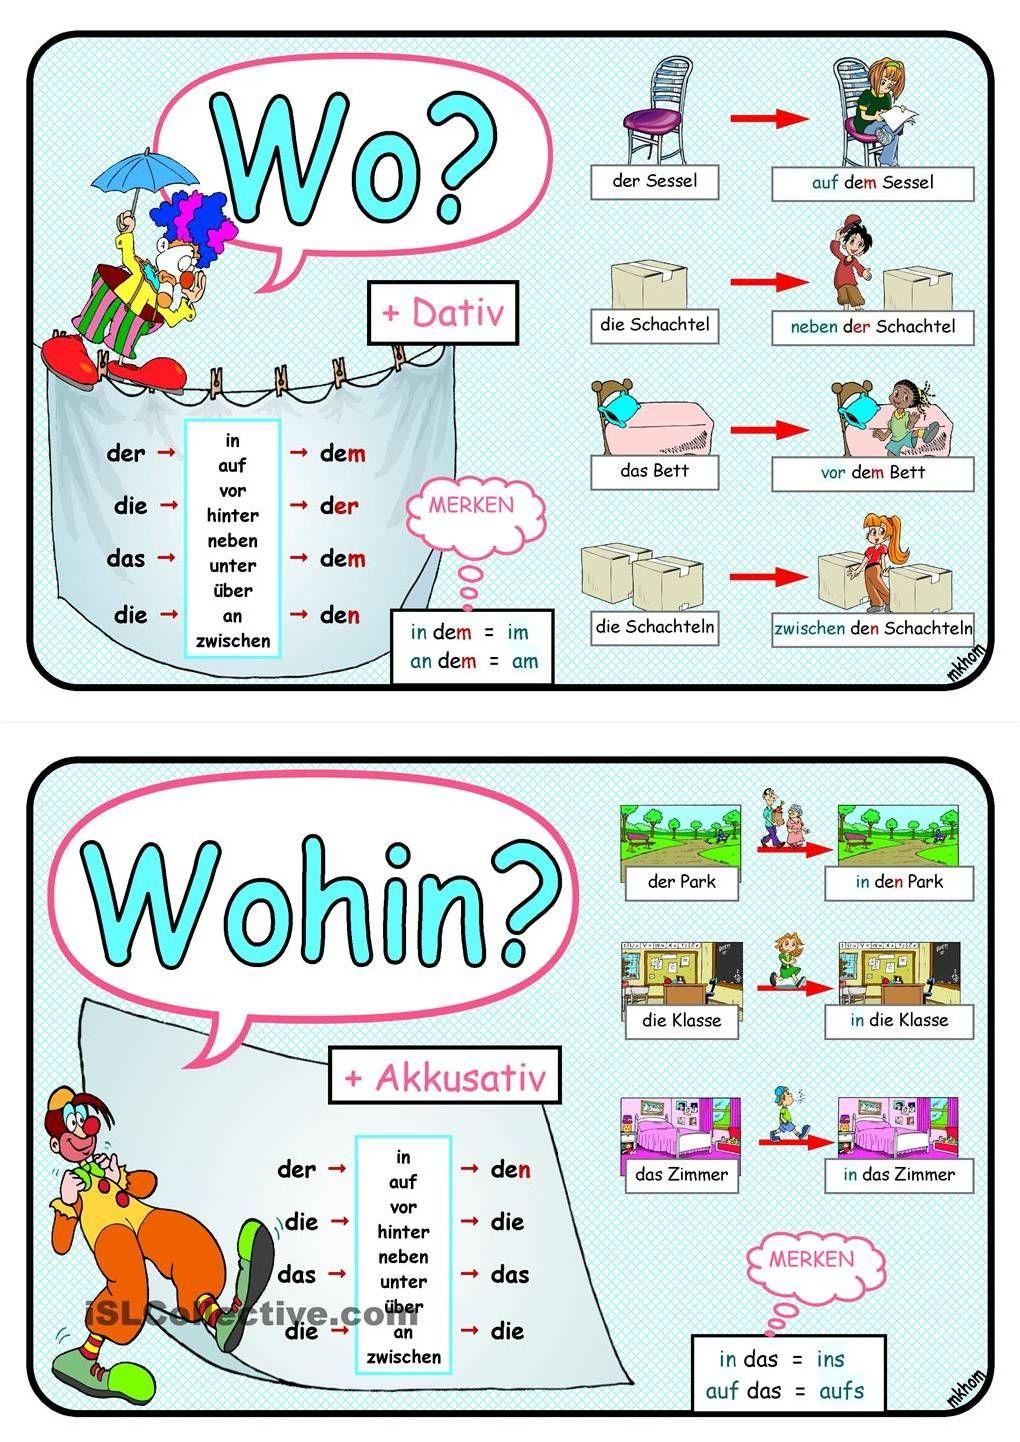 Duits - Deutsch - Fälle - naamvallen - Wechselpräpositionen - keuzevoorzetsels - Dativ - Akkusativ                                                                                                                                                                                 More